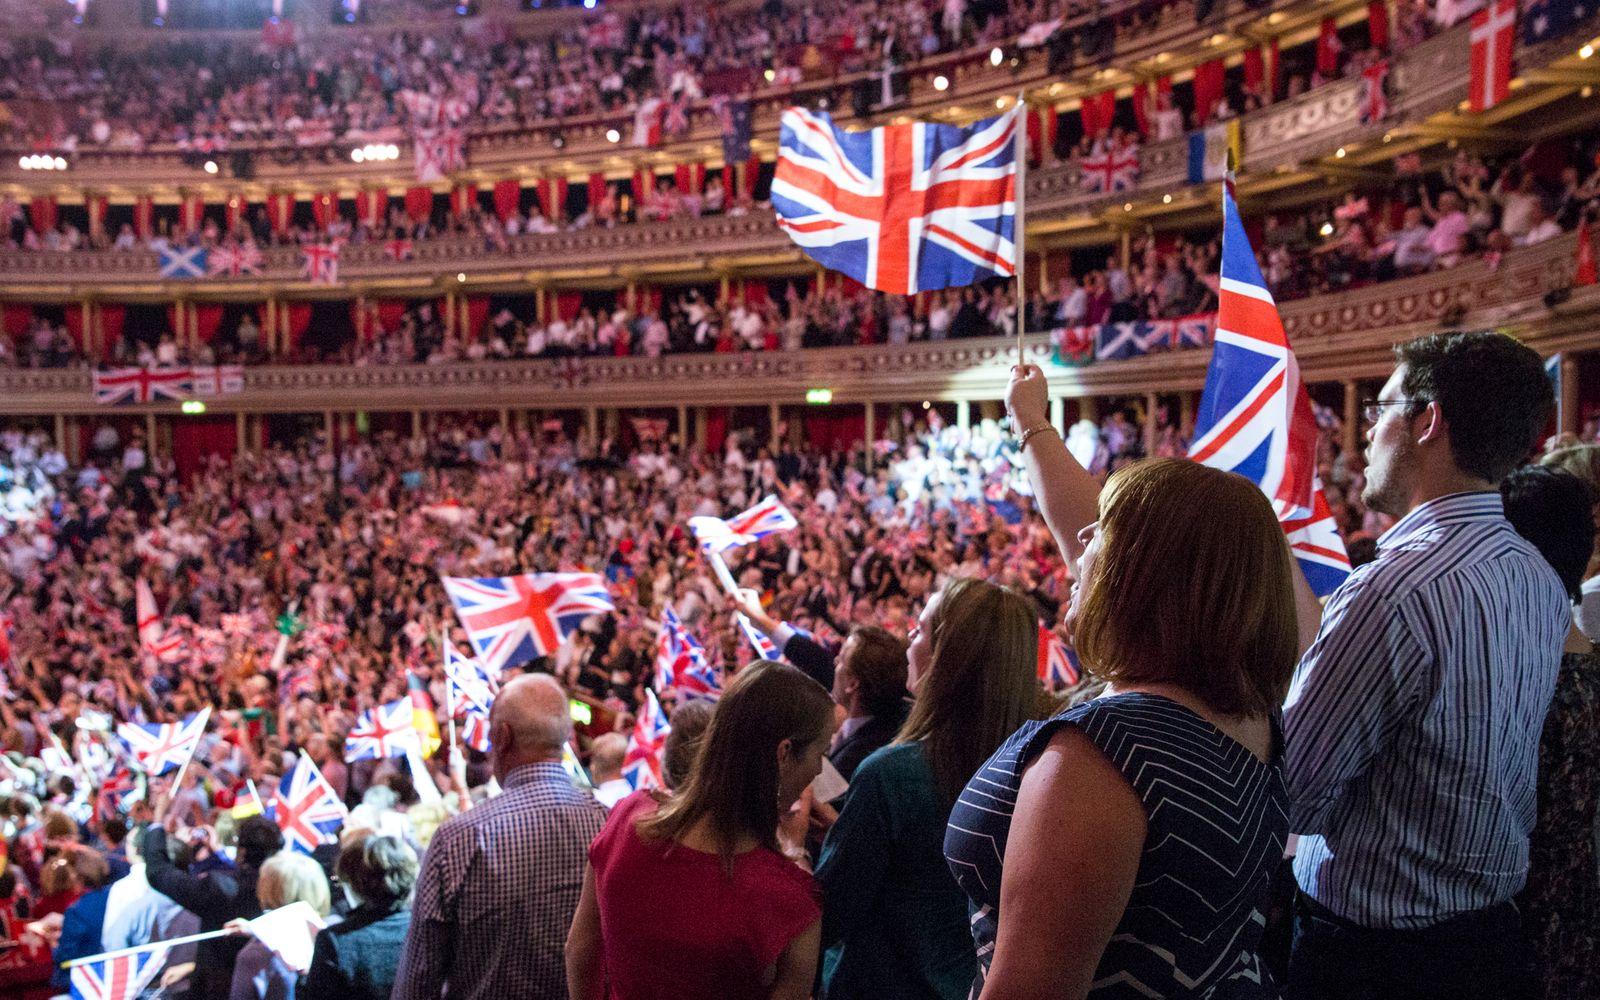 Last Night Of The Proms 2014 - Royal Albert Hall